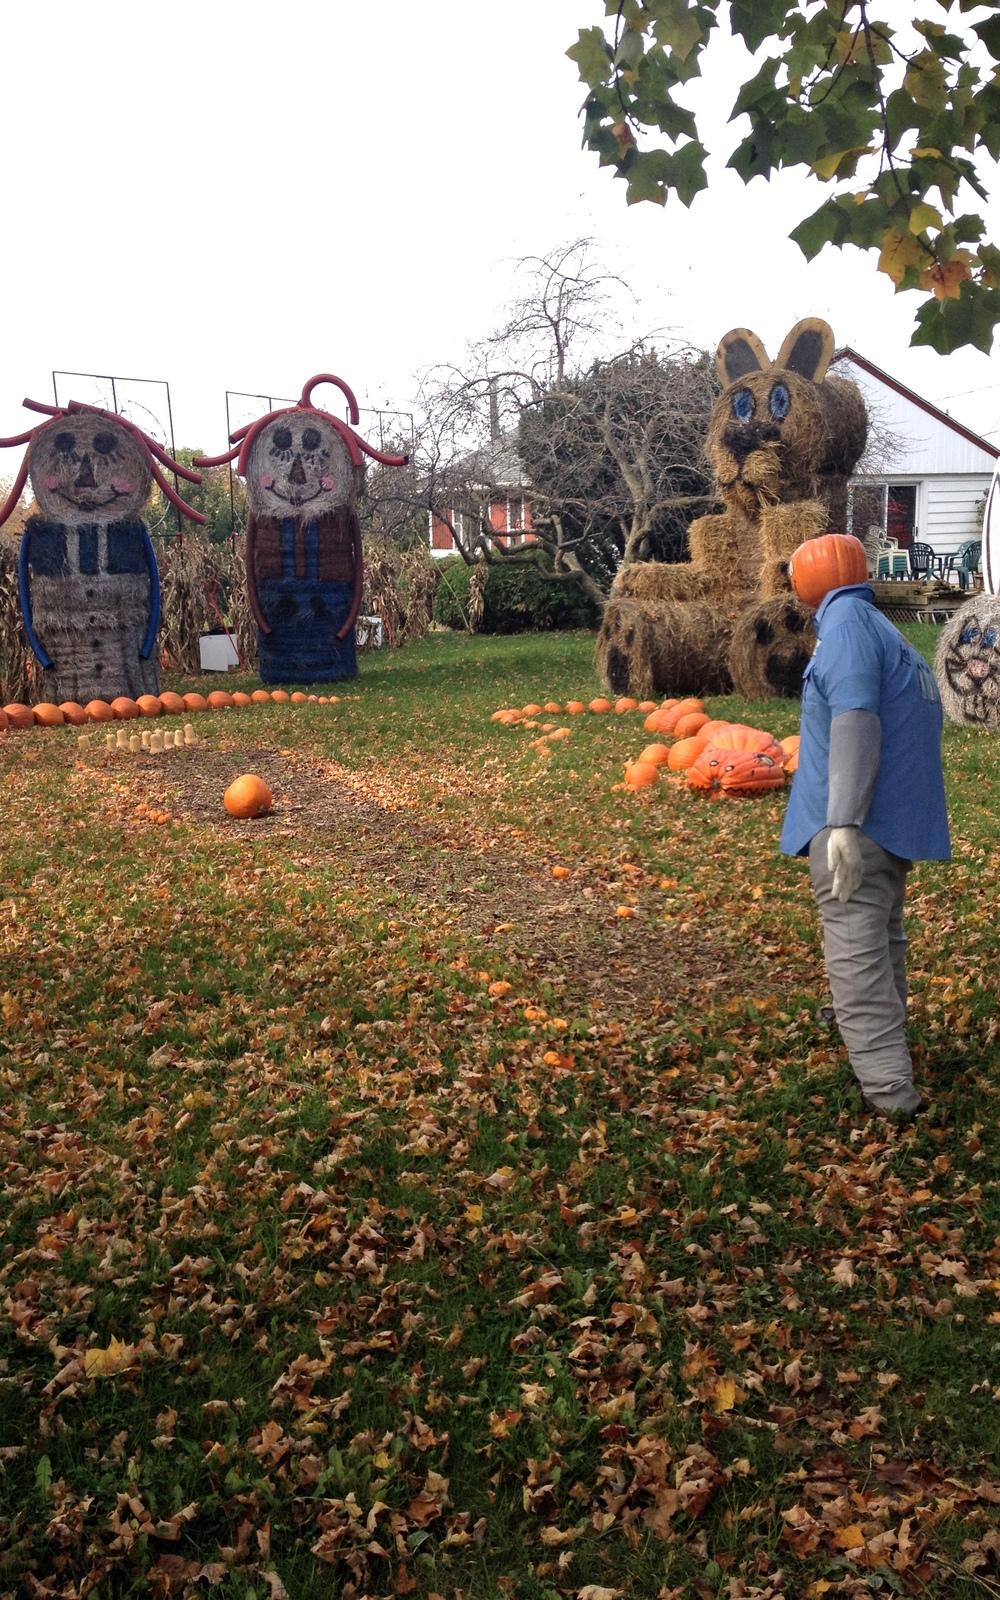 Bowling with pumpkins and pumpkin-gator spectators.